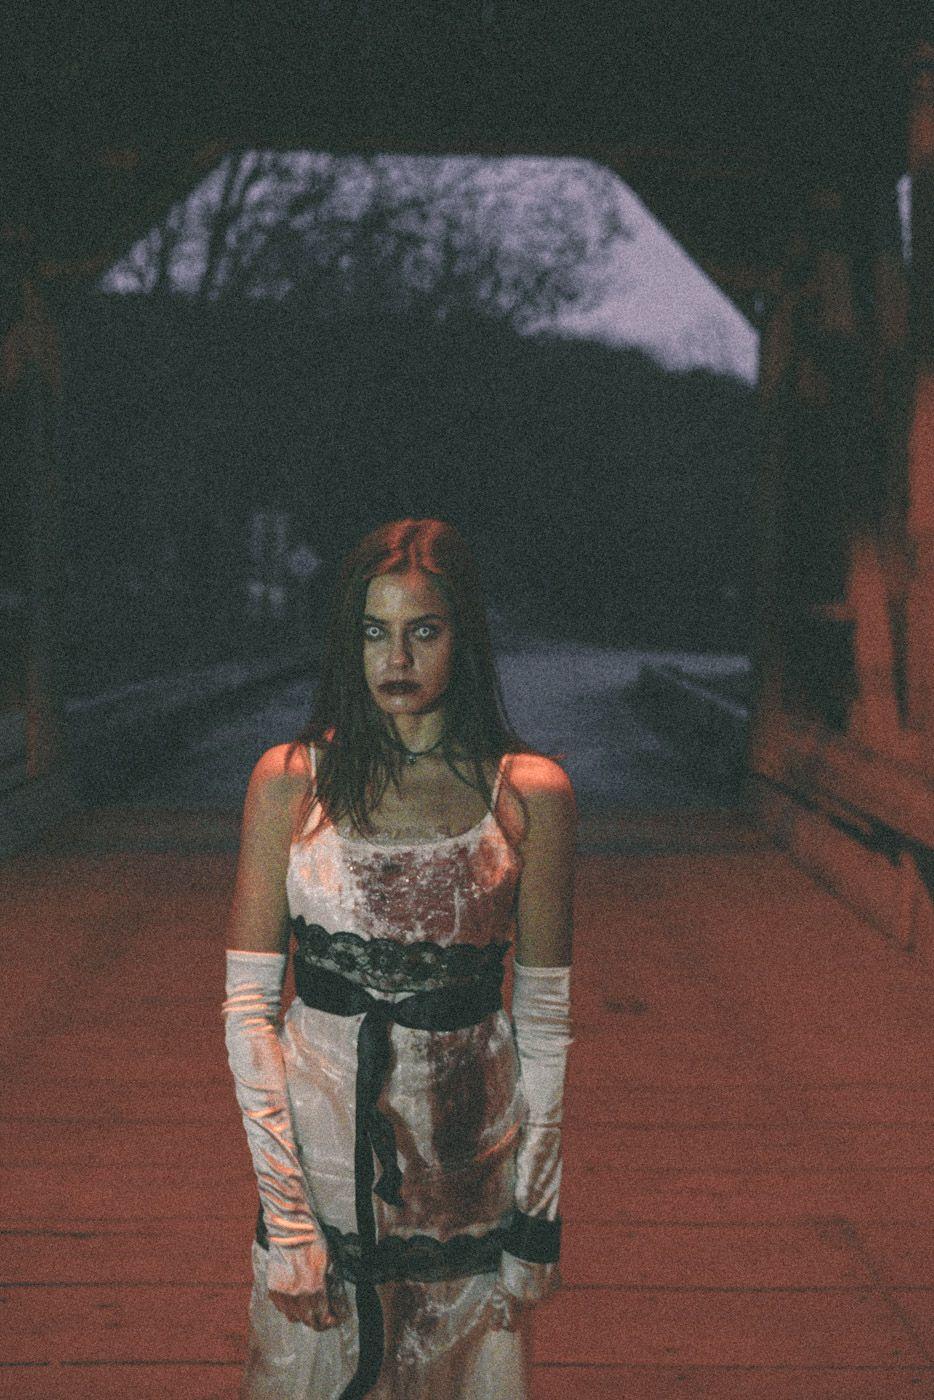 Megan Fox Jennifer S Body Diy Halloween Costume Fox Halloween Costume Fox Halloween Haloween Costumes [ 1400 x 934 Pixel ]